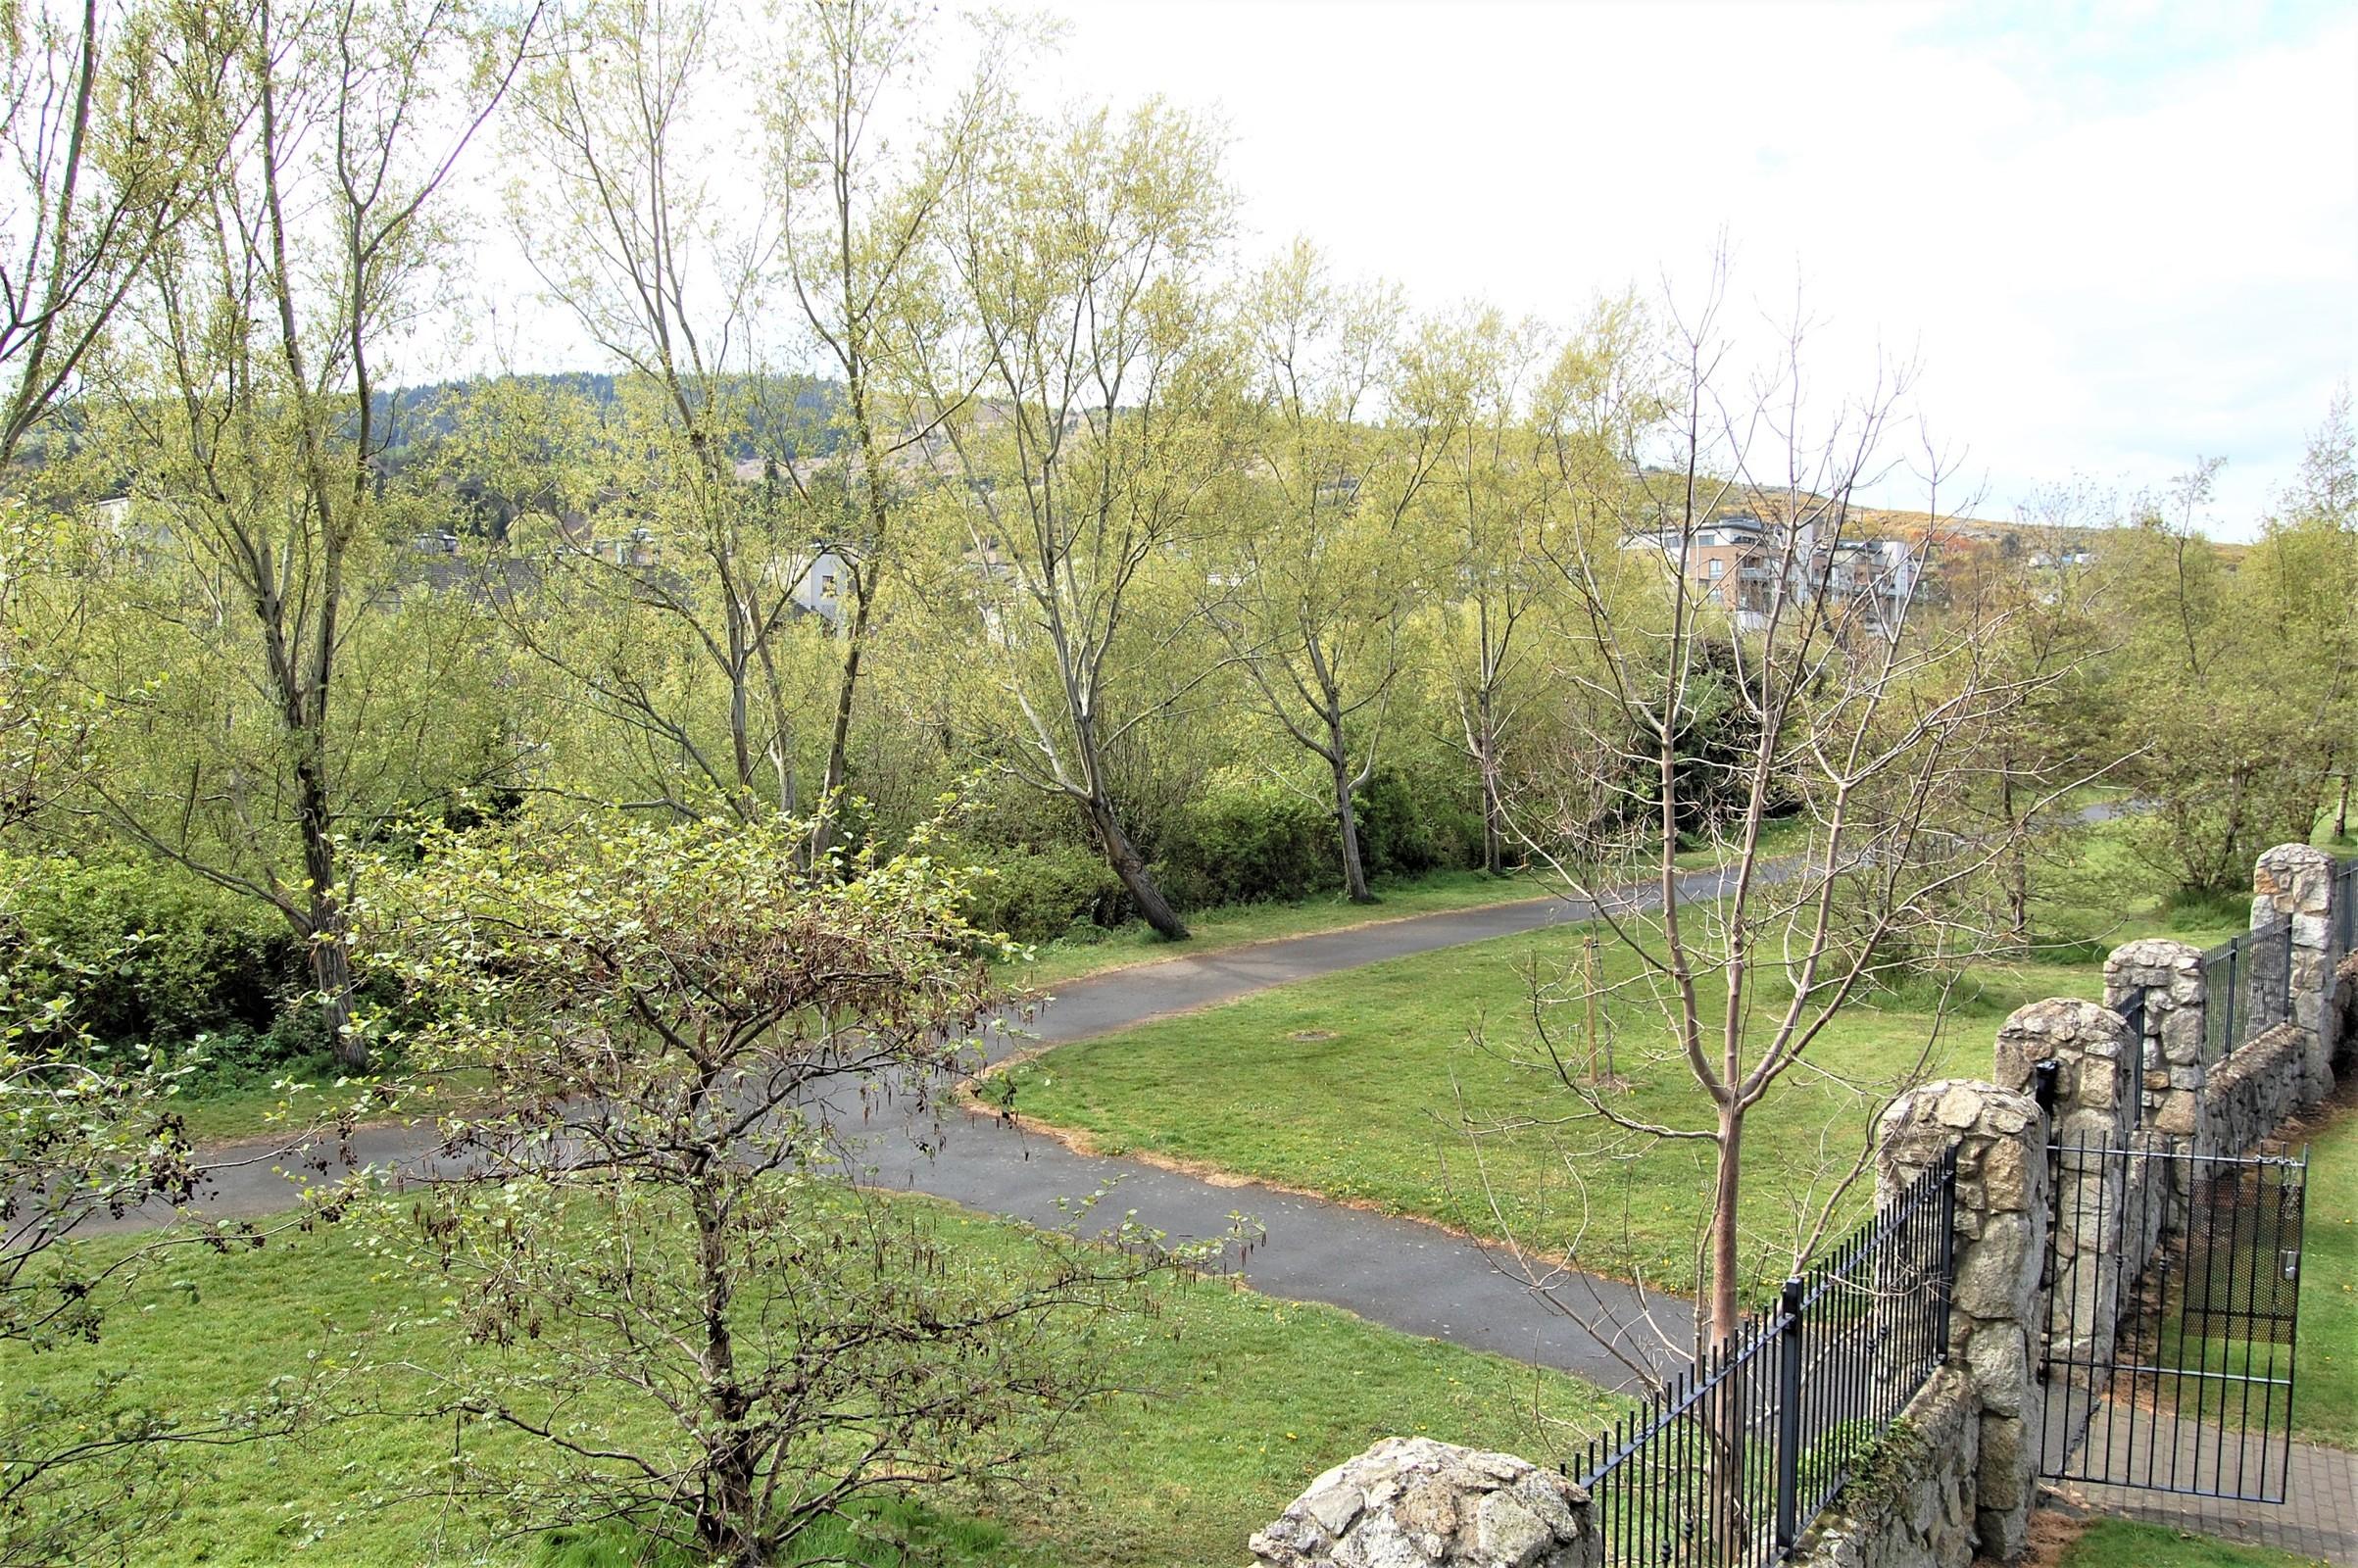 88 Grianan Fidh, Aiken's Village, Sandyford, Dublin 18